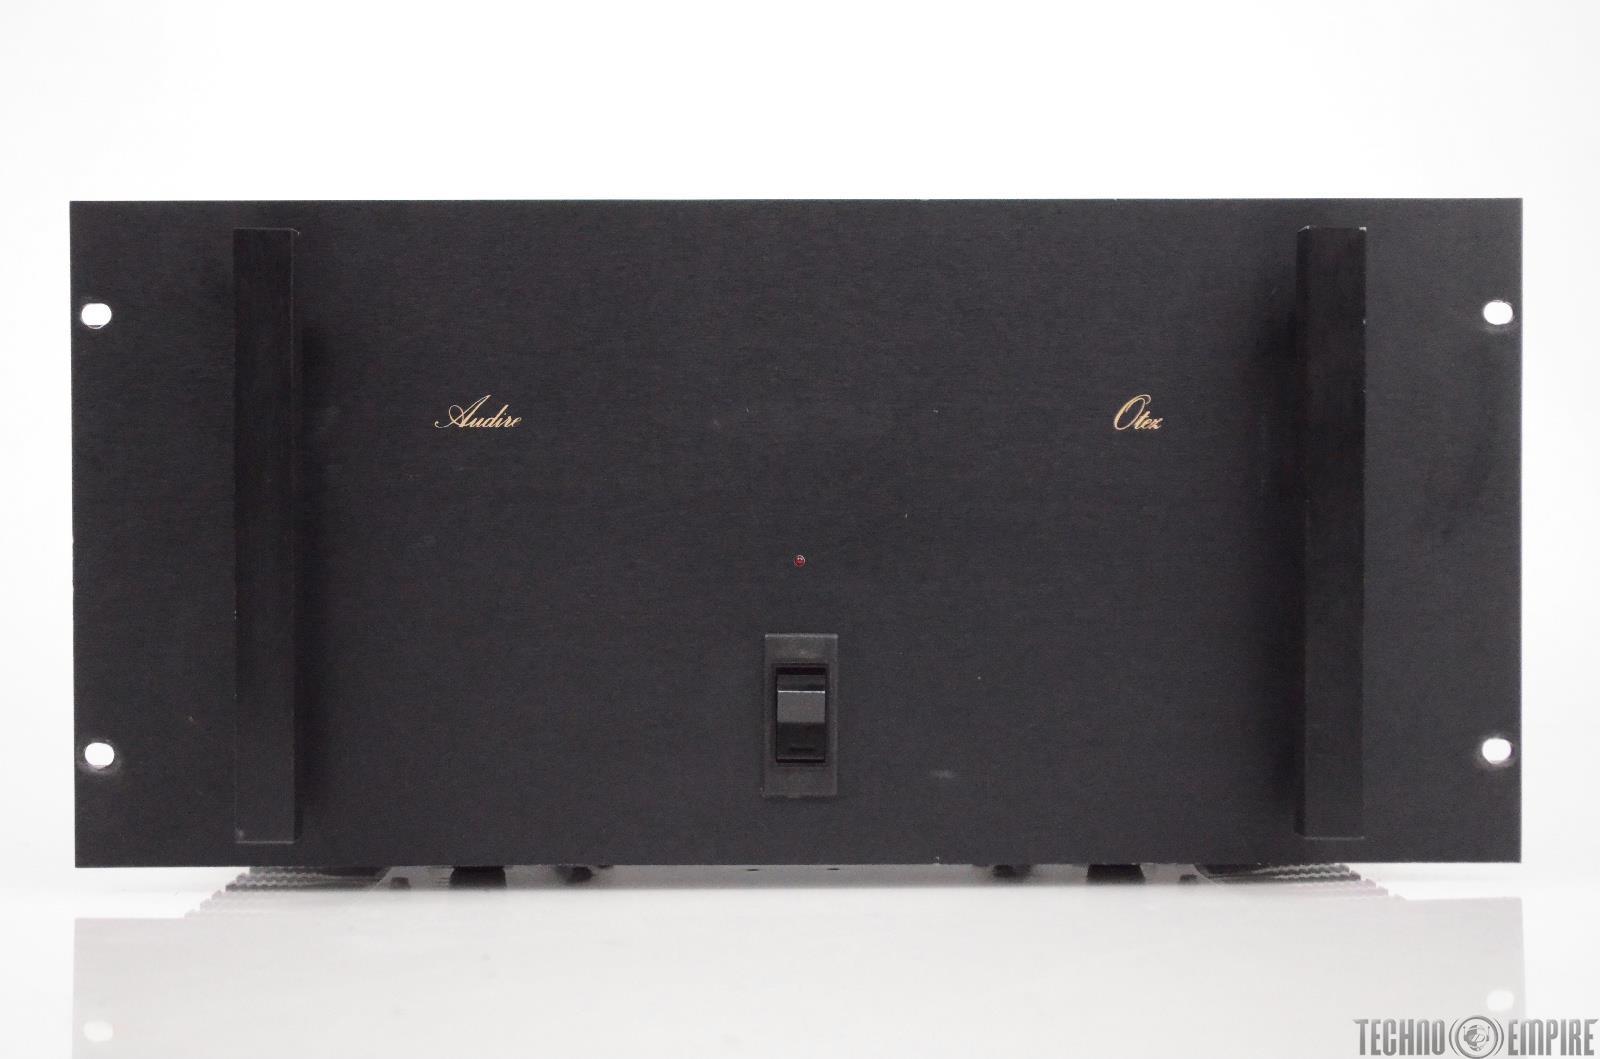 Audire Otez Stereo Power Amplifier 1750 Watt 2 Channel Audiophile Amp #31156